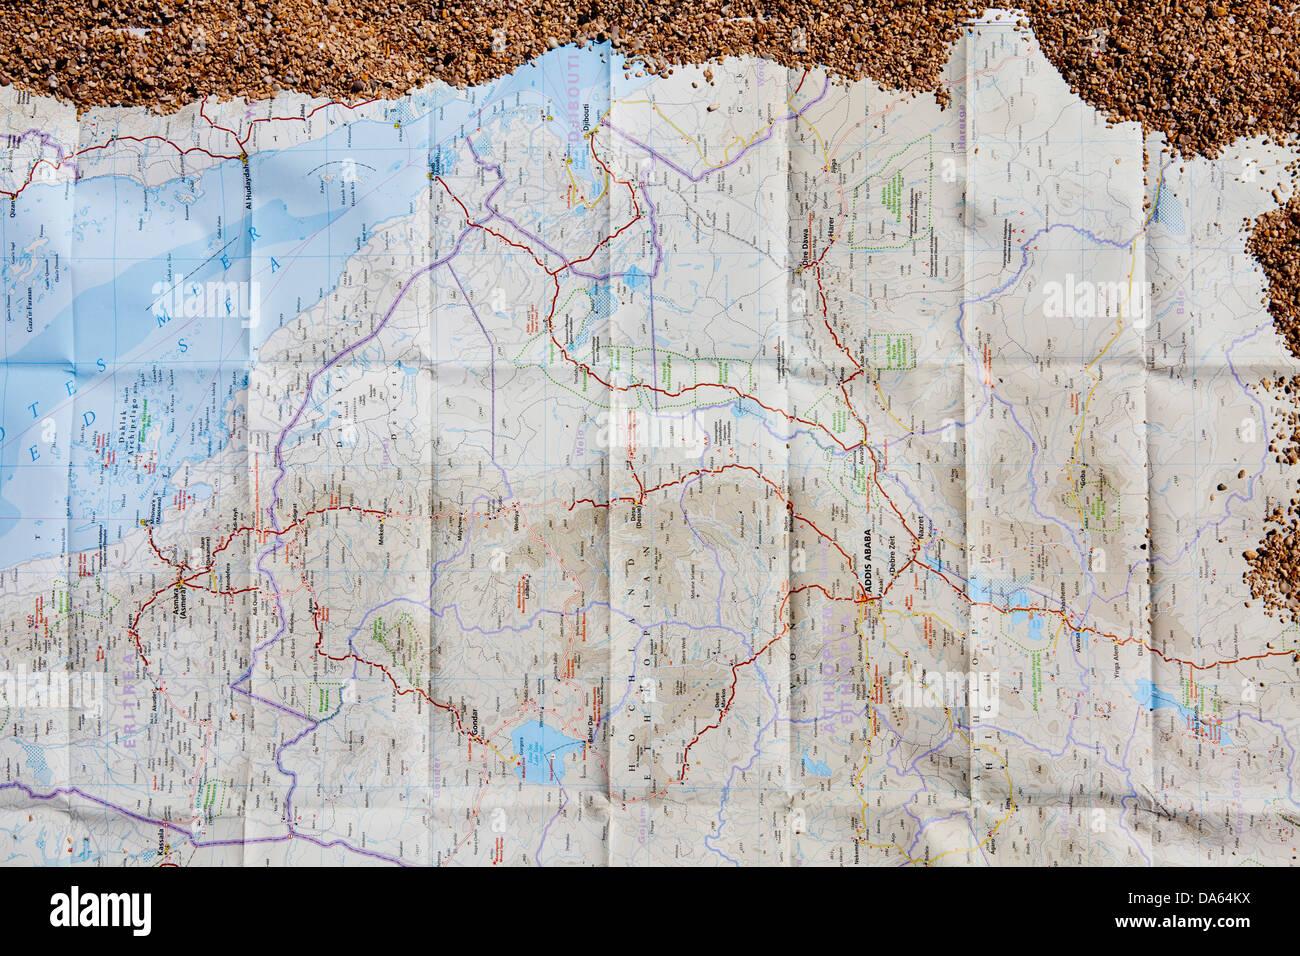 Karte, Karte, Äthiopien, Dschibuti, Afrika, Sand, Karte Stockbild